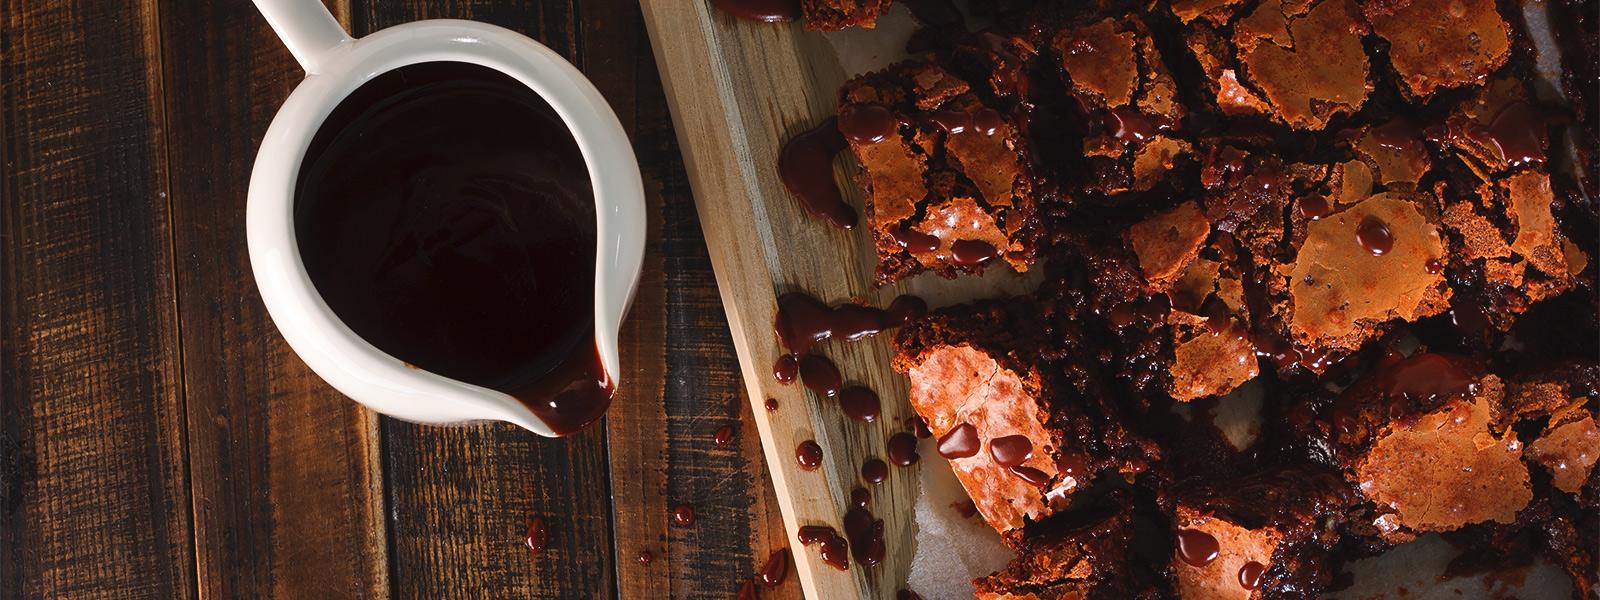 брауни и горячий шоколад